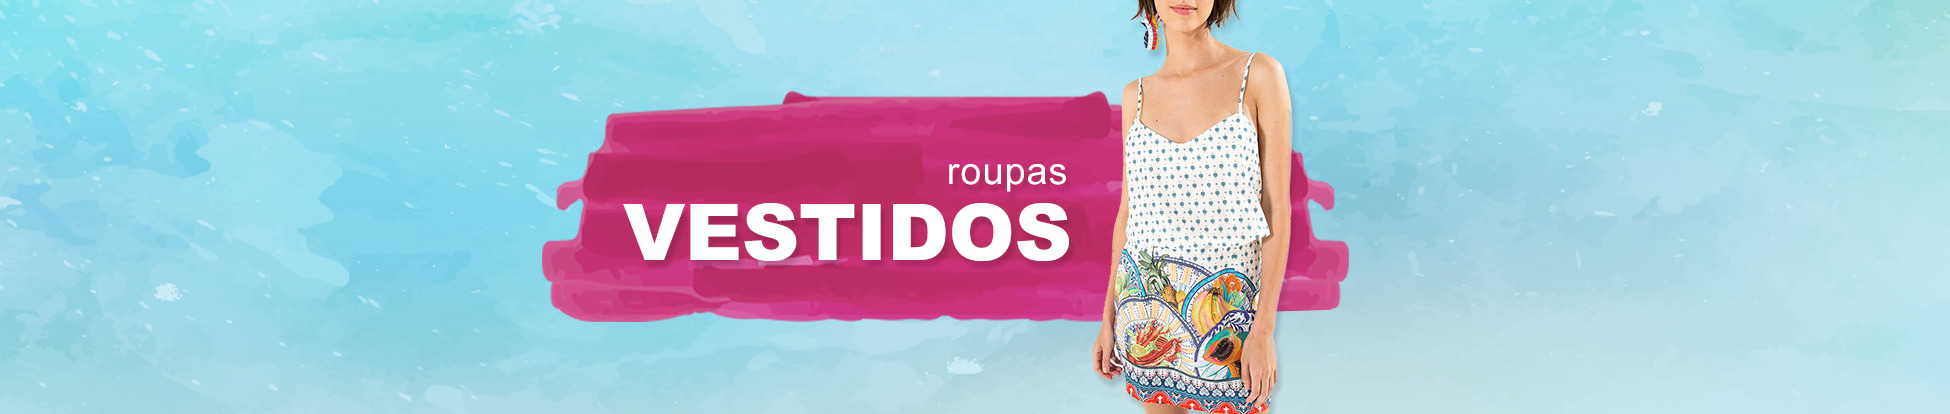 Roupas - Vestidos